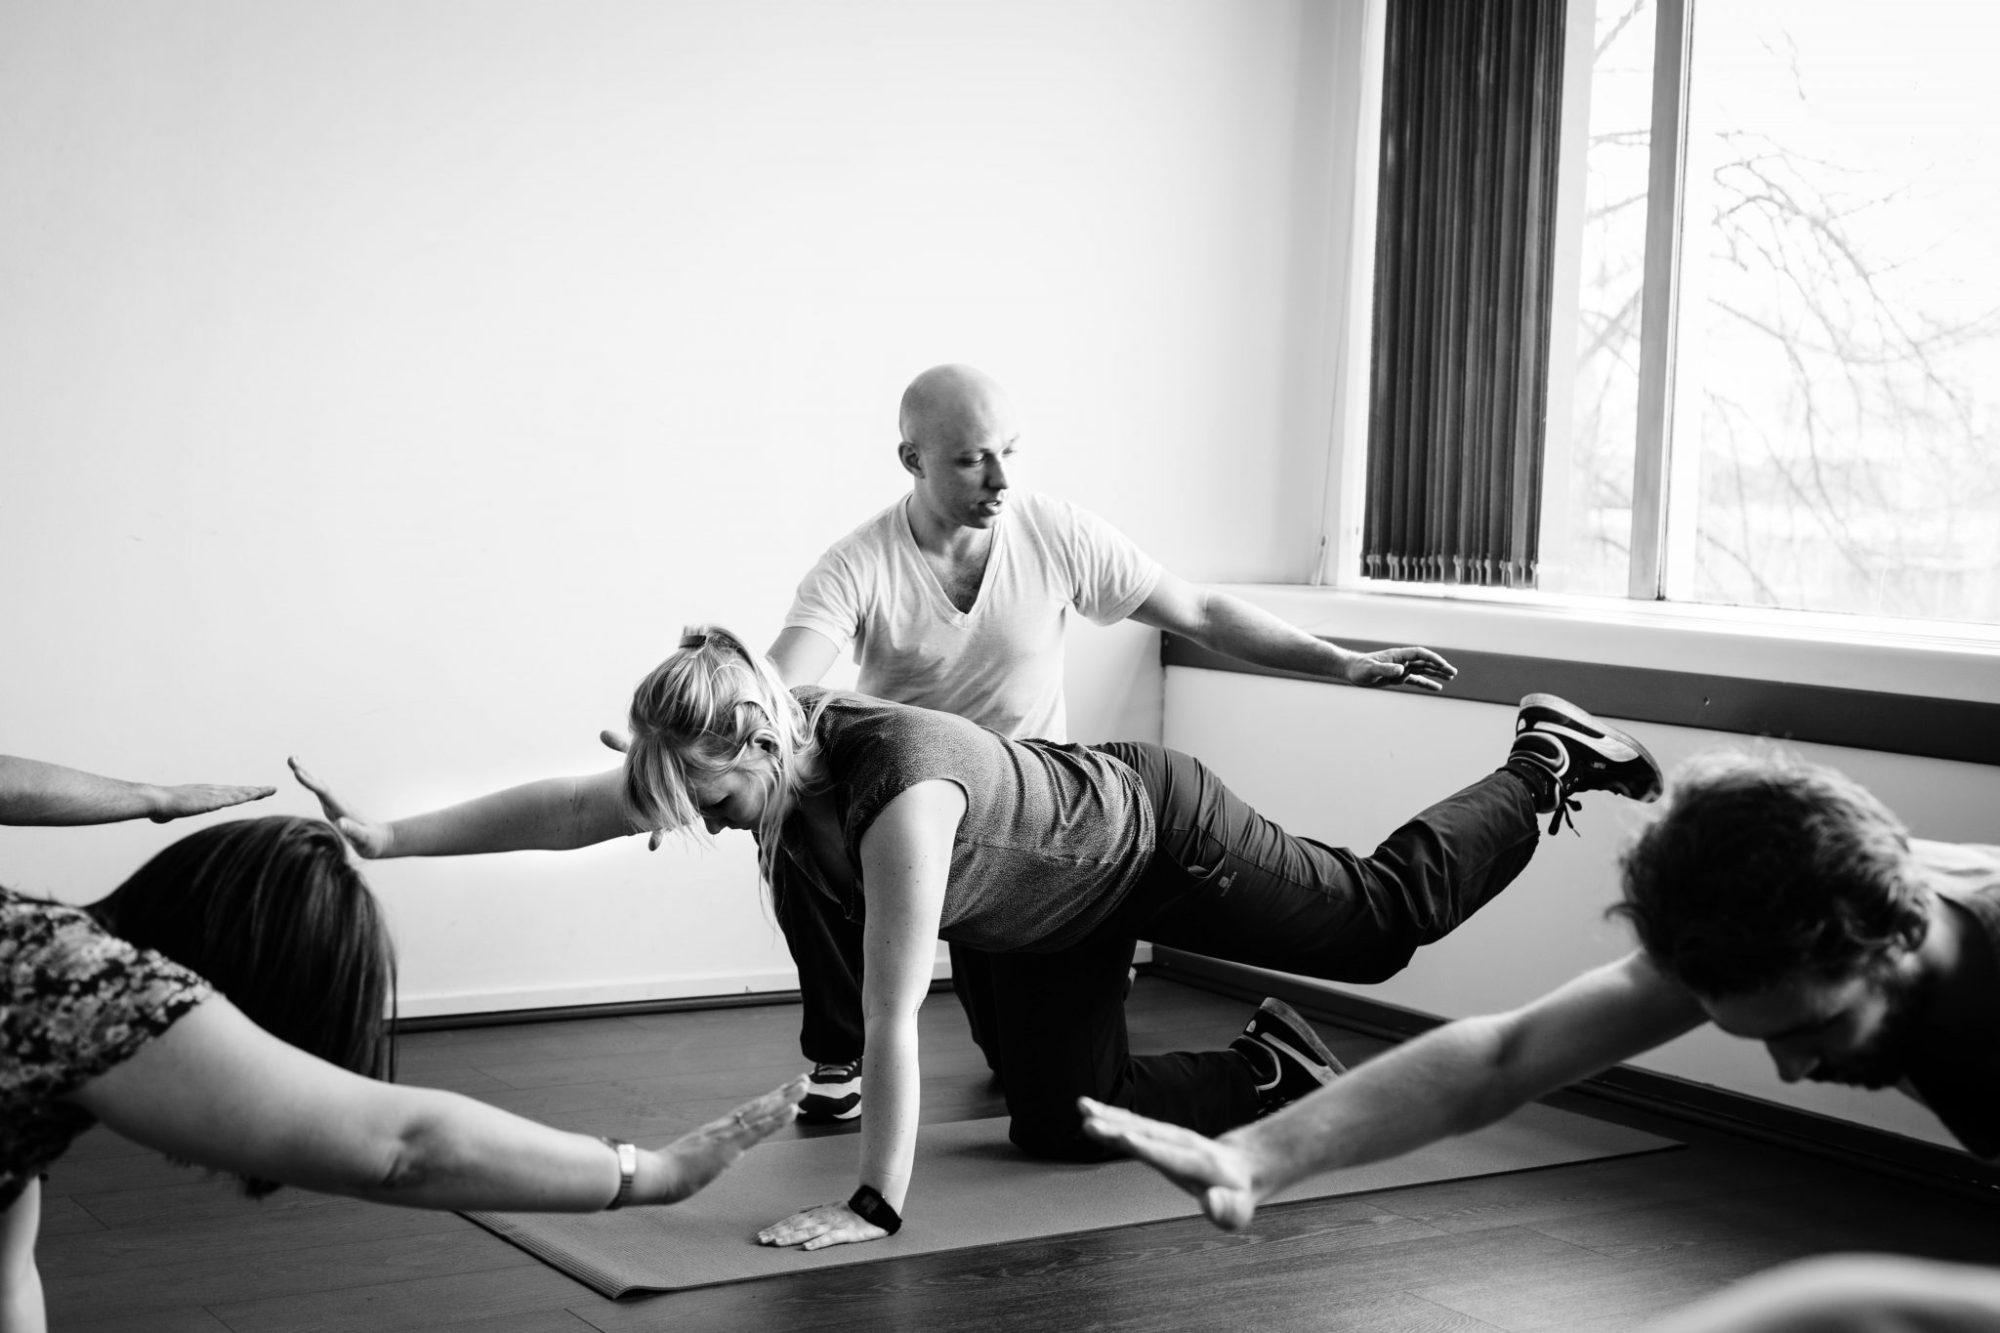 Samenwerking met Ian Du Mont, personal training